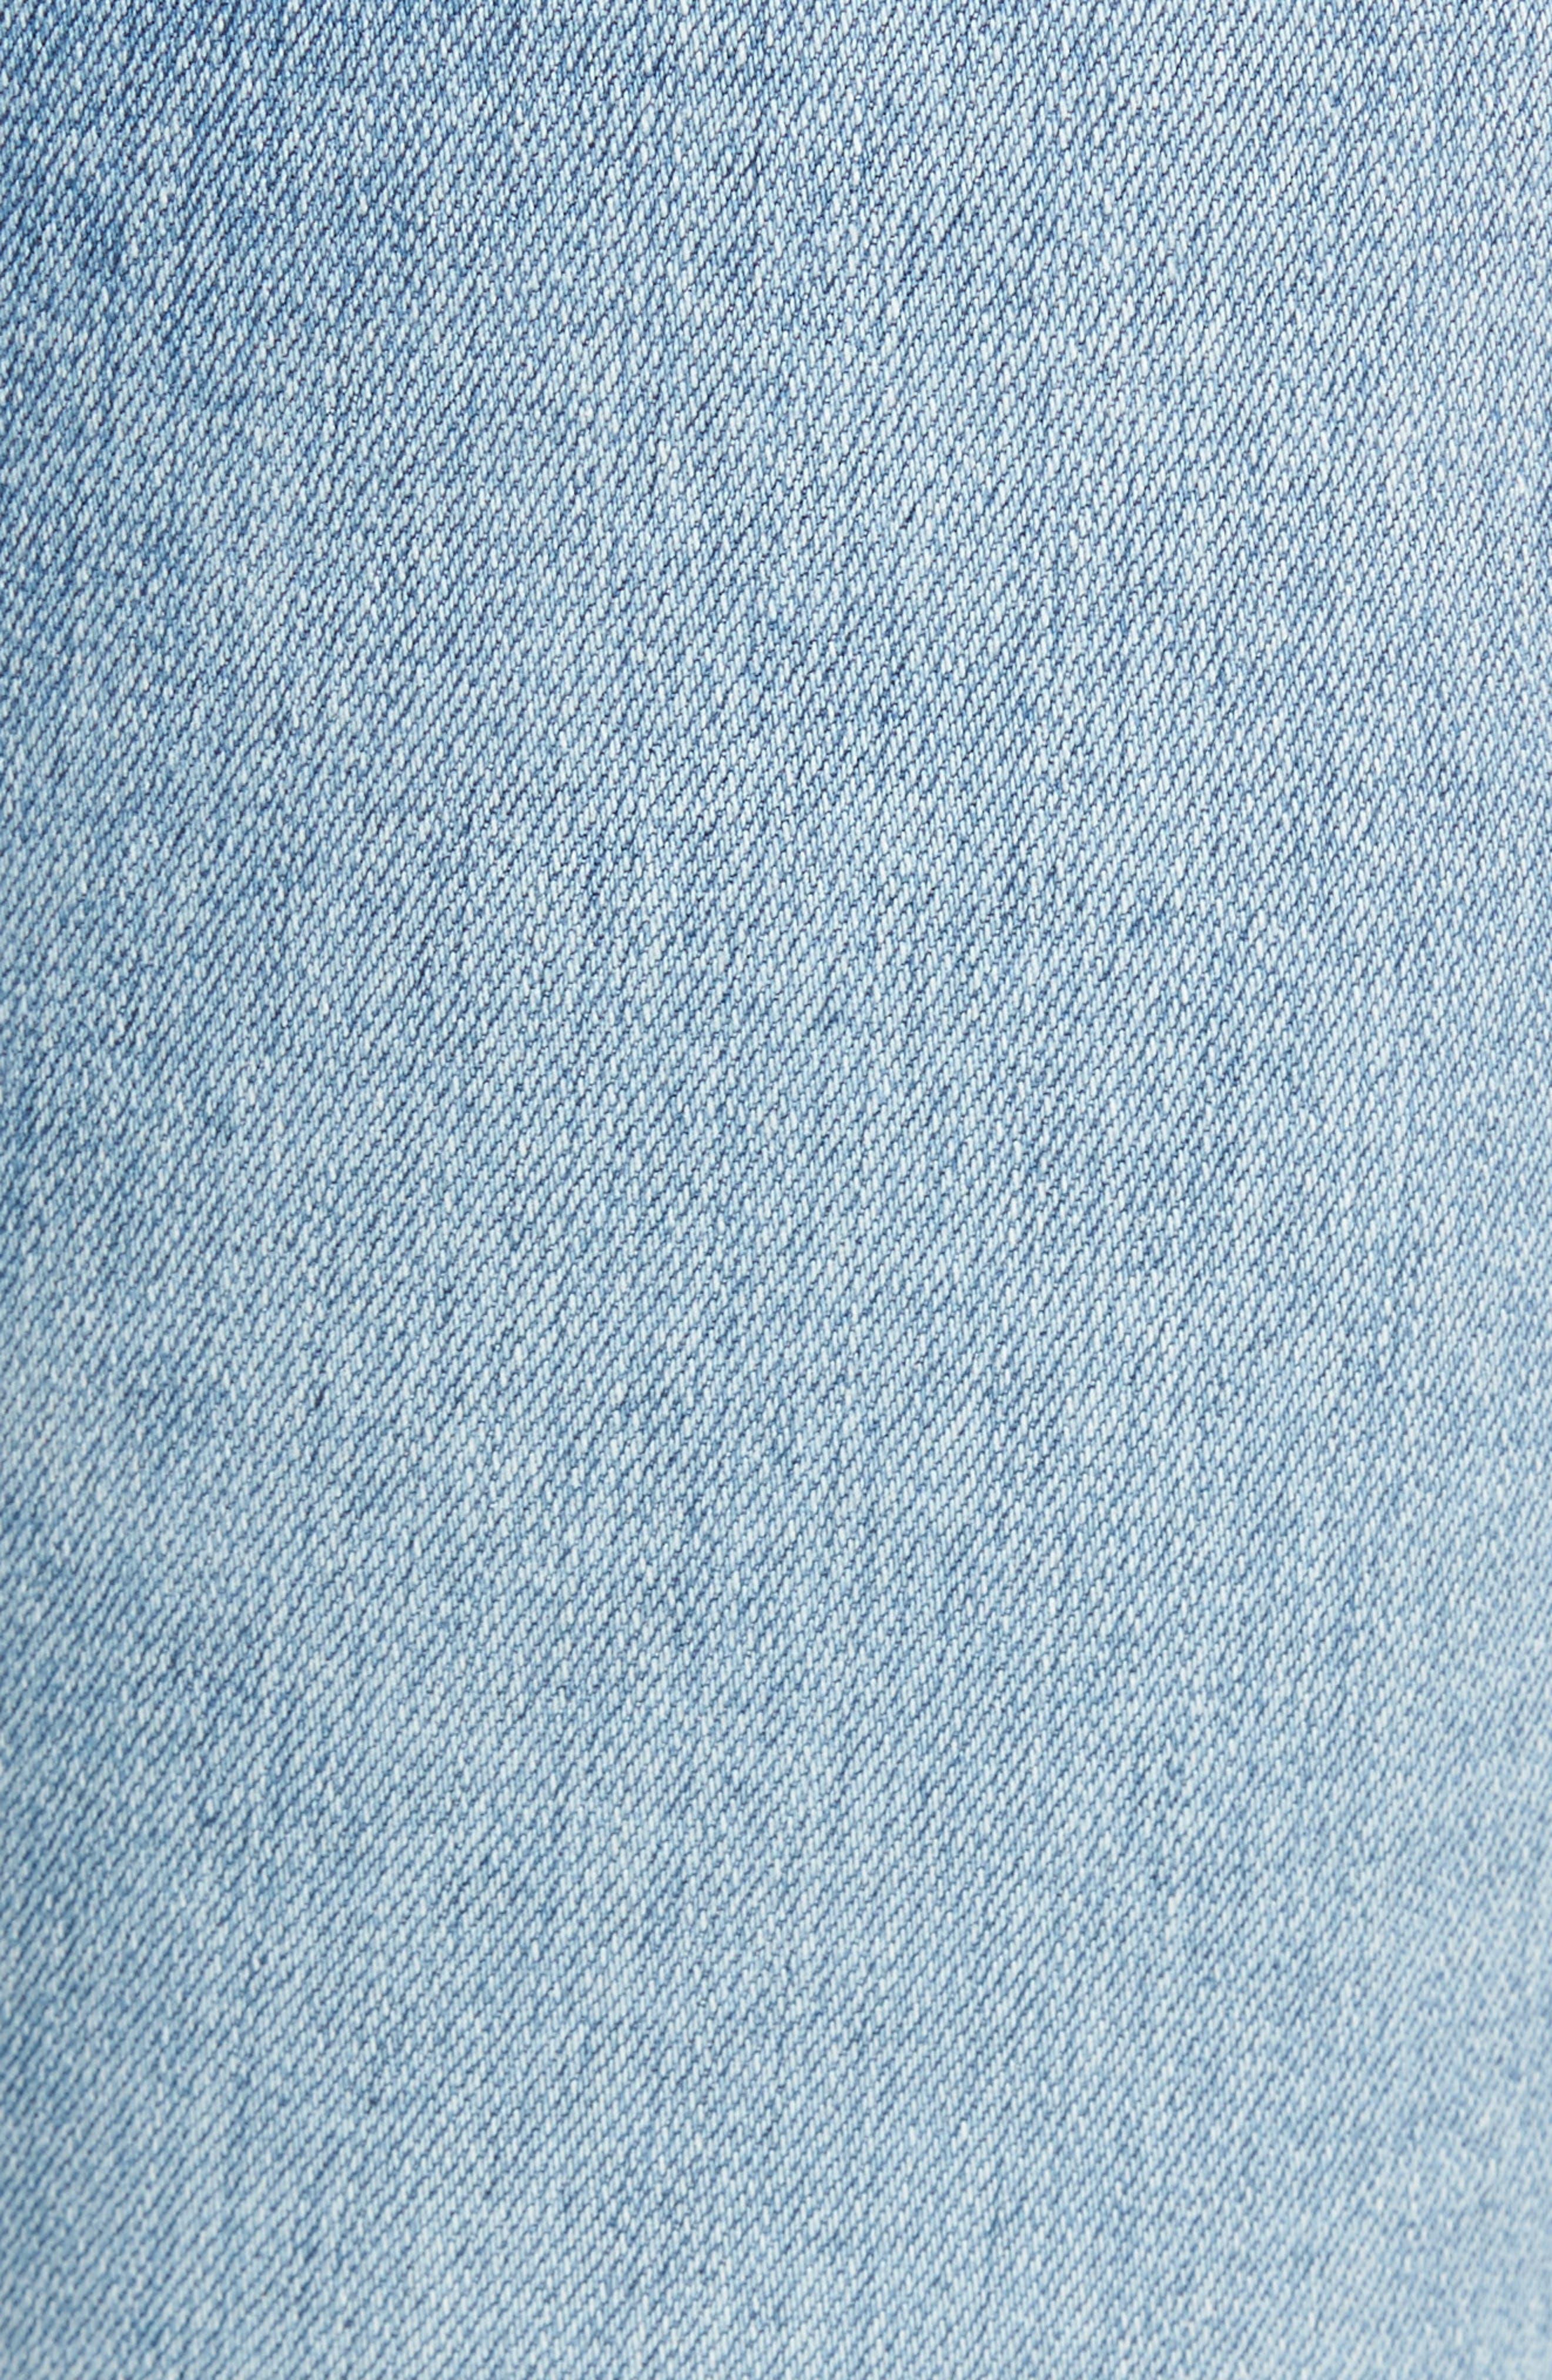 Mila High Waist Ankle Skinny Jeans,                             Alternate thumbnail 6, color,                             426